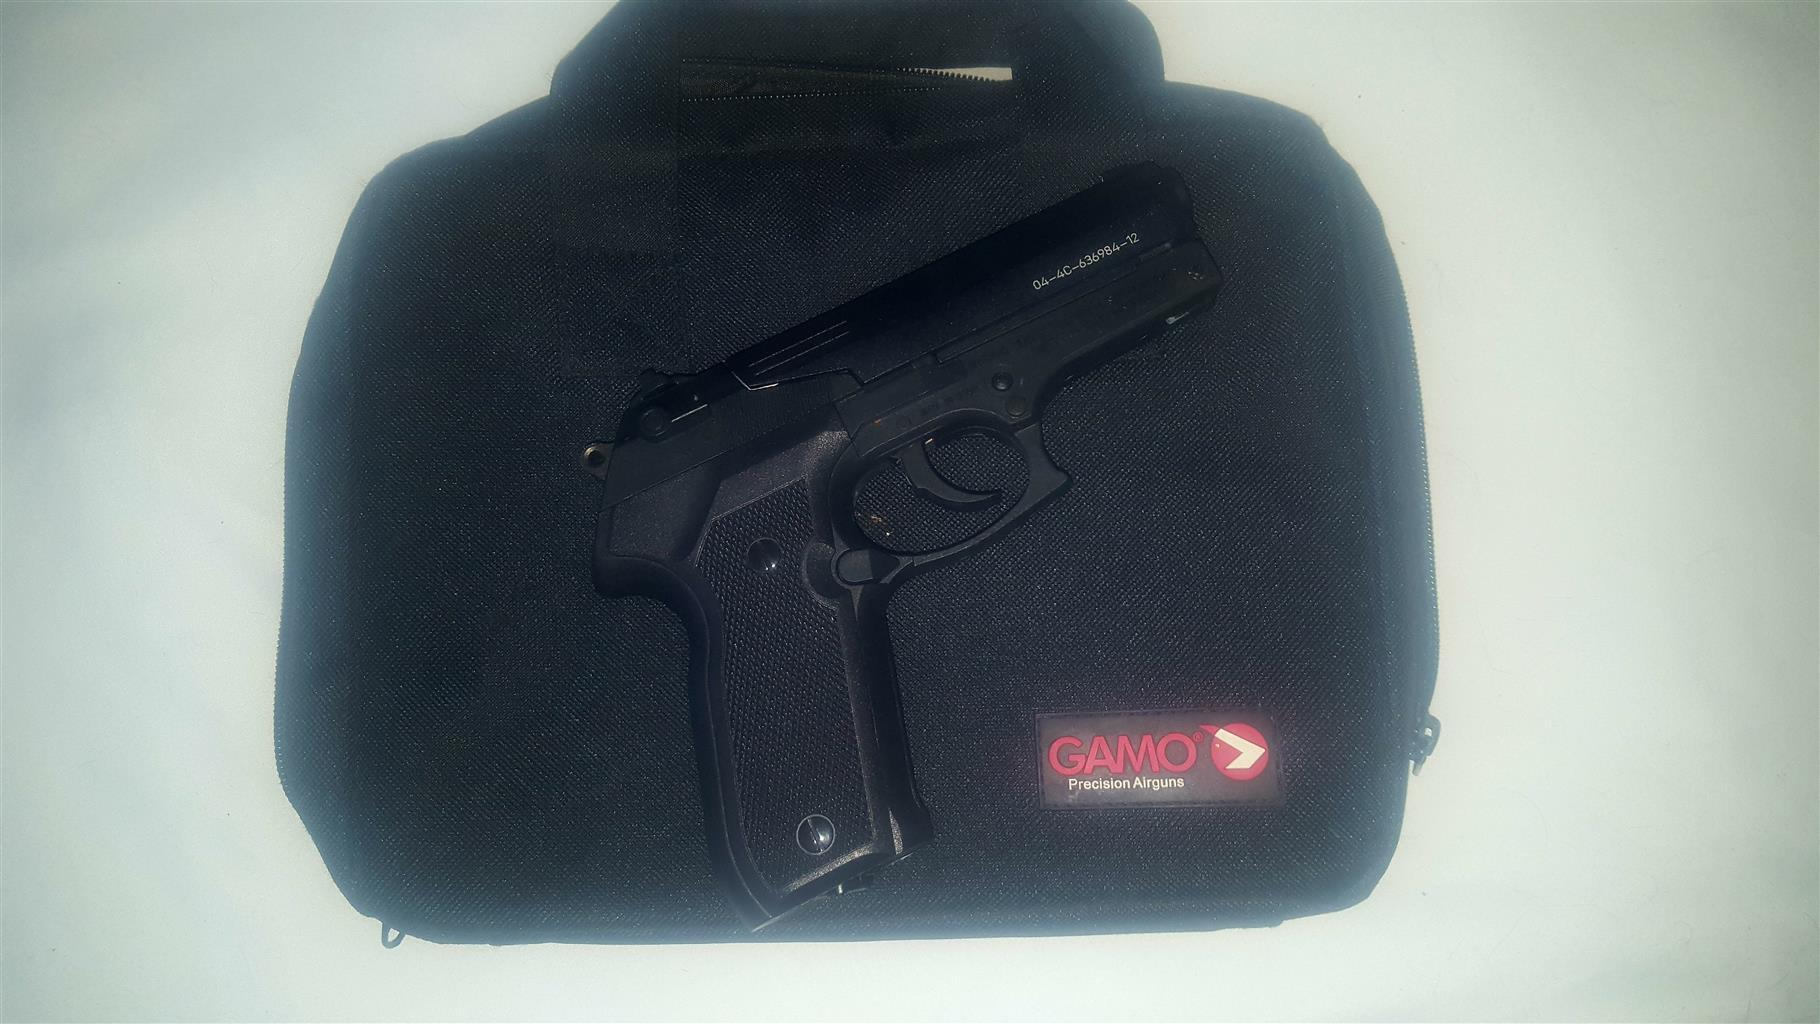 Gamo gas pellet pistol for sale